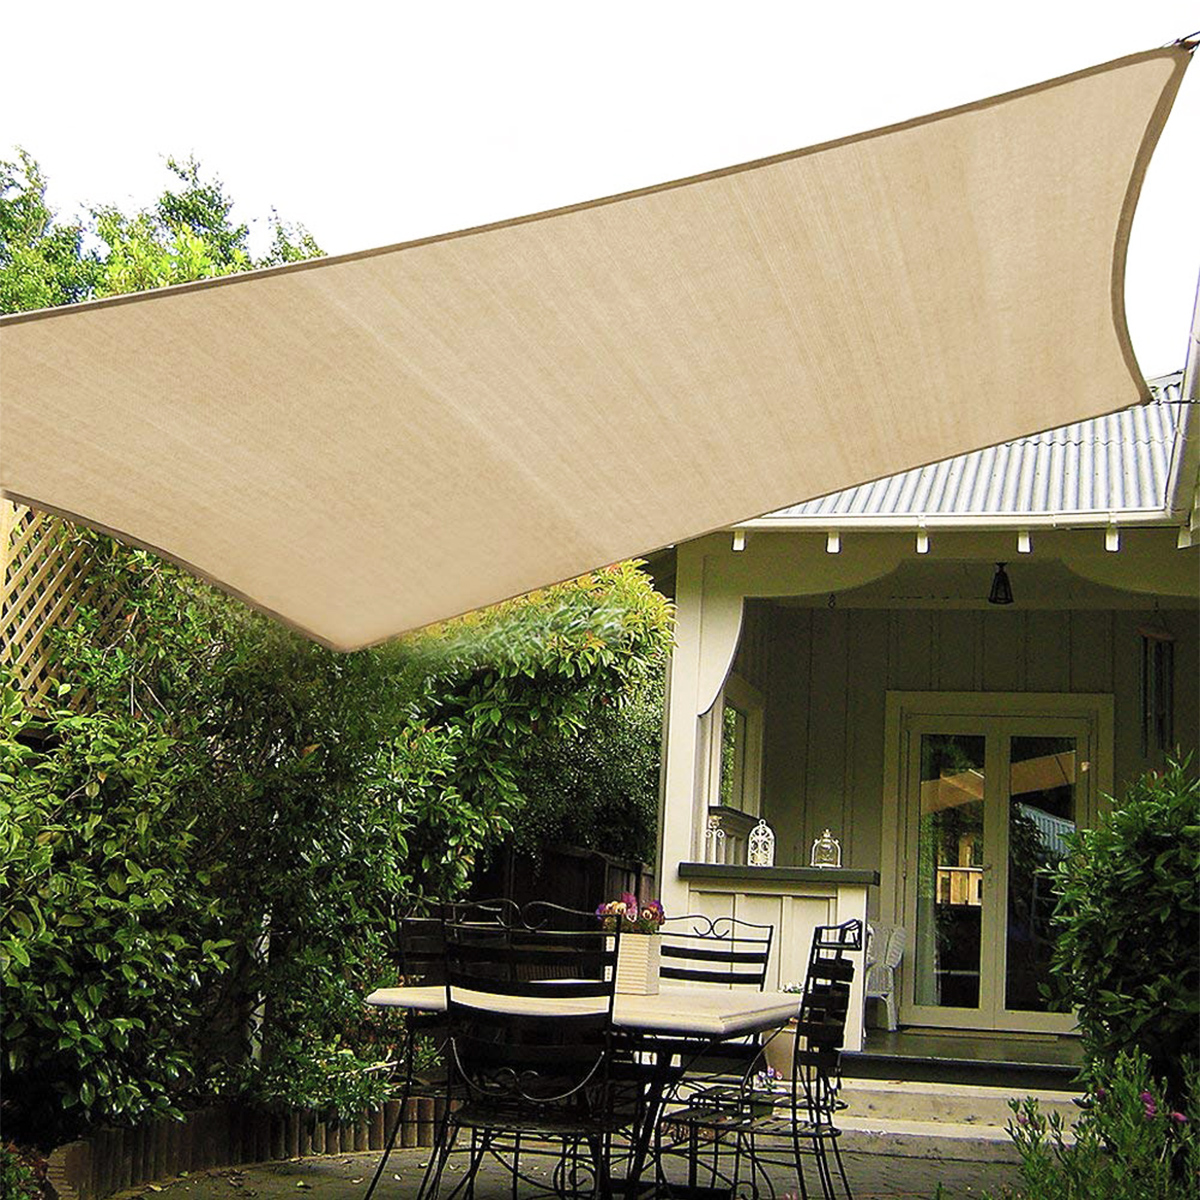 300D Tent Sunshade Waterproof UV Canopy Portable Camping Hanging Tent Folding Picnic Mat